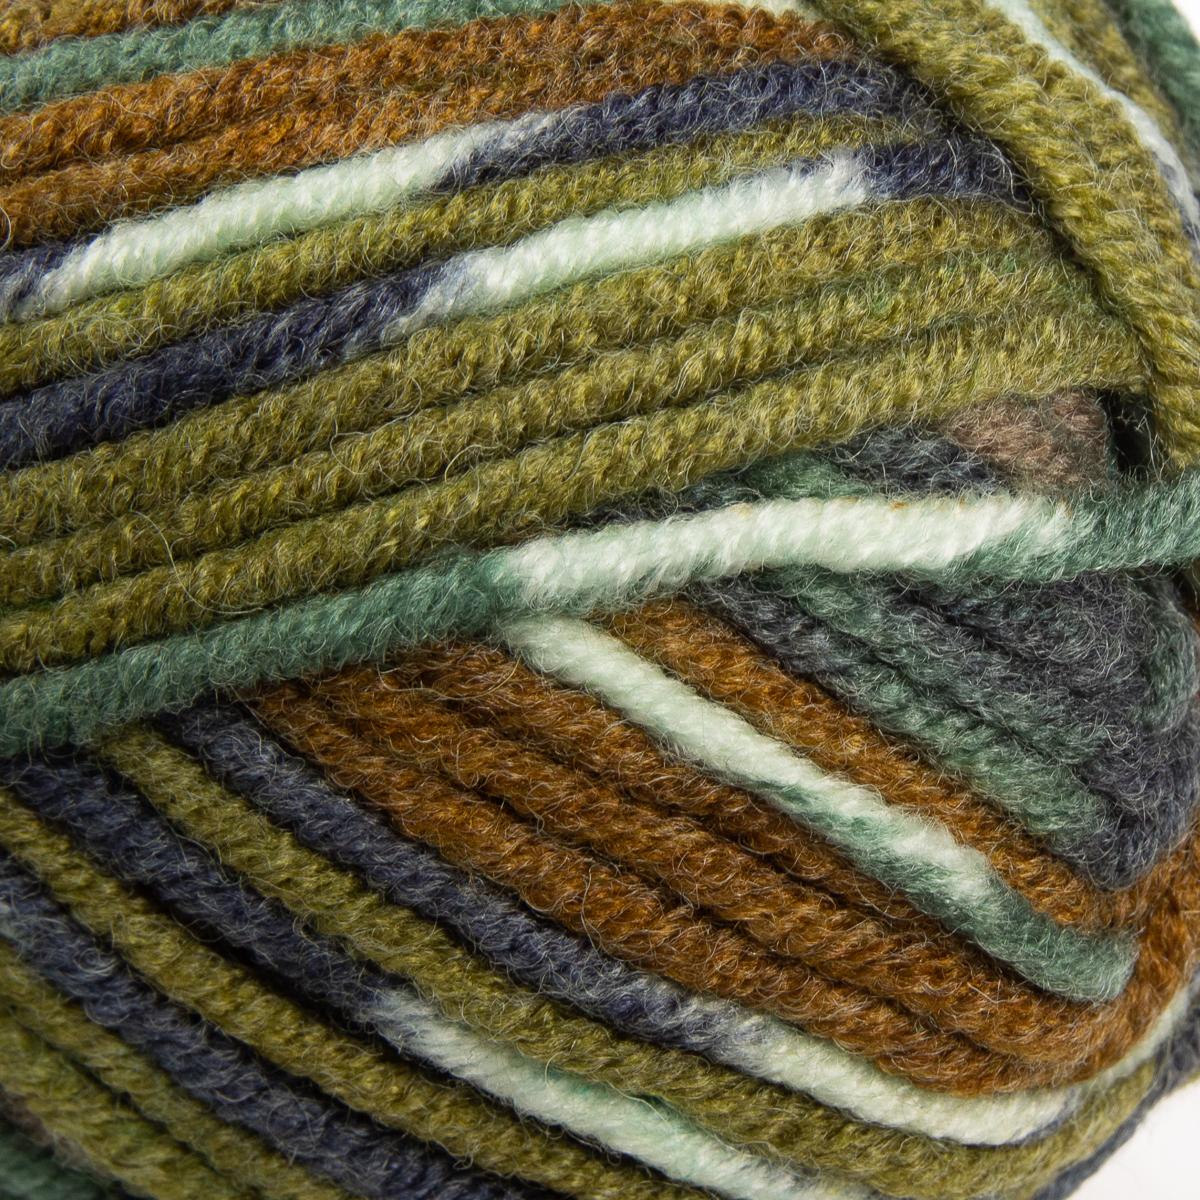 3pk-Lion-Brand-Woolspun-Acrylic-amp-Wool-Yarn-Bulky-5-Knit-Crocheting-Skeins-Soft thumbnail 31